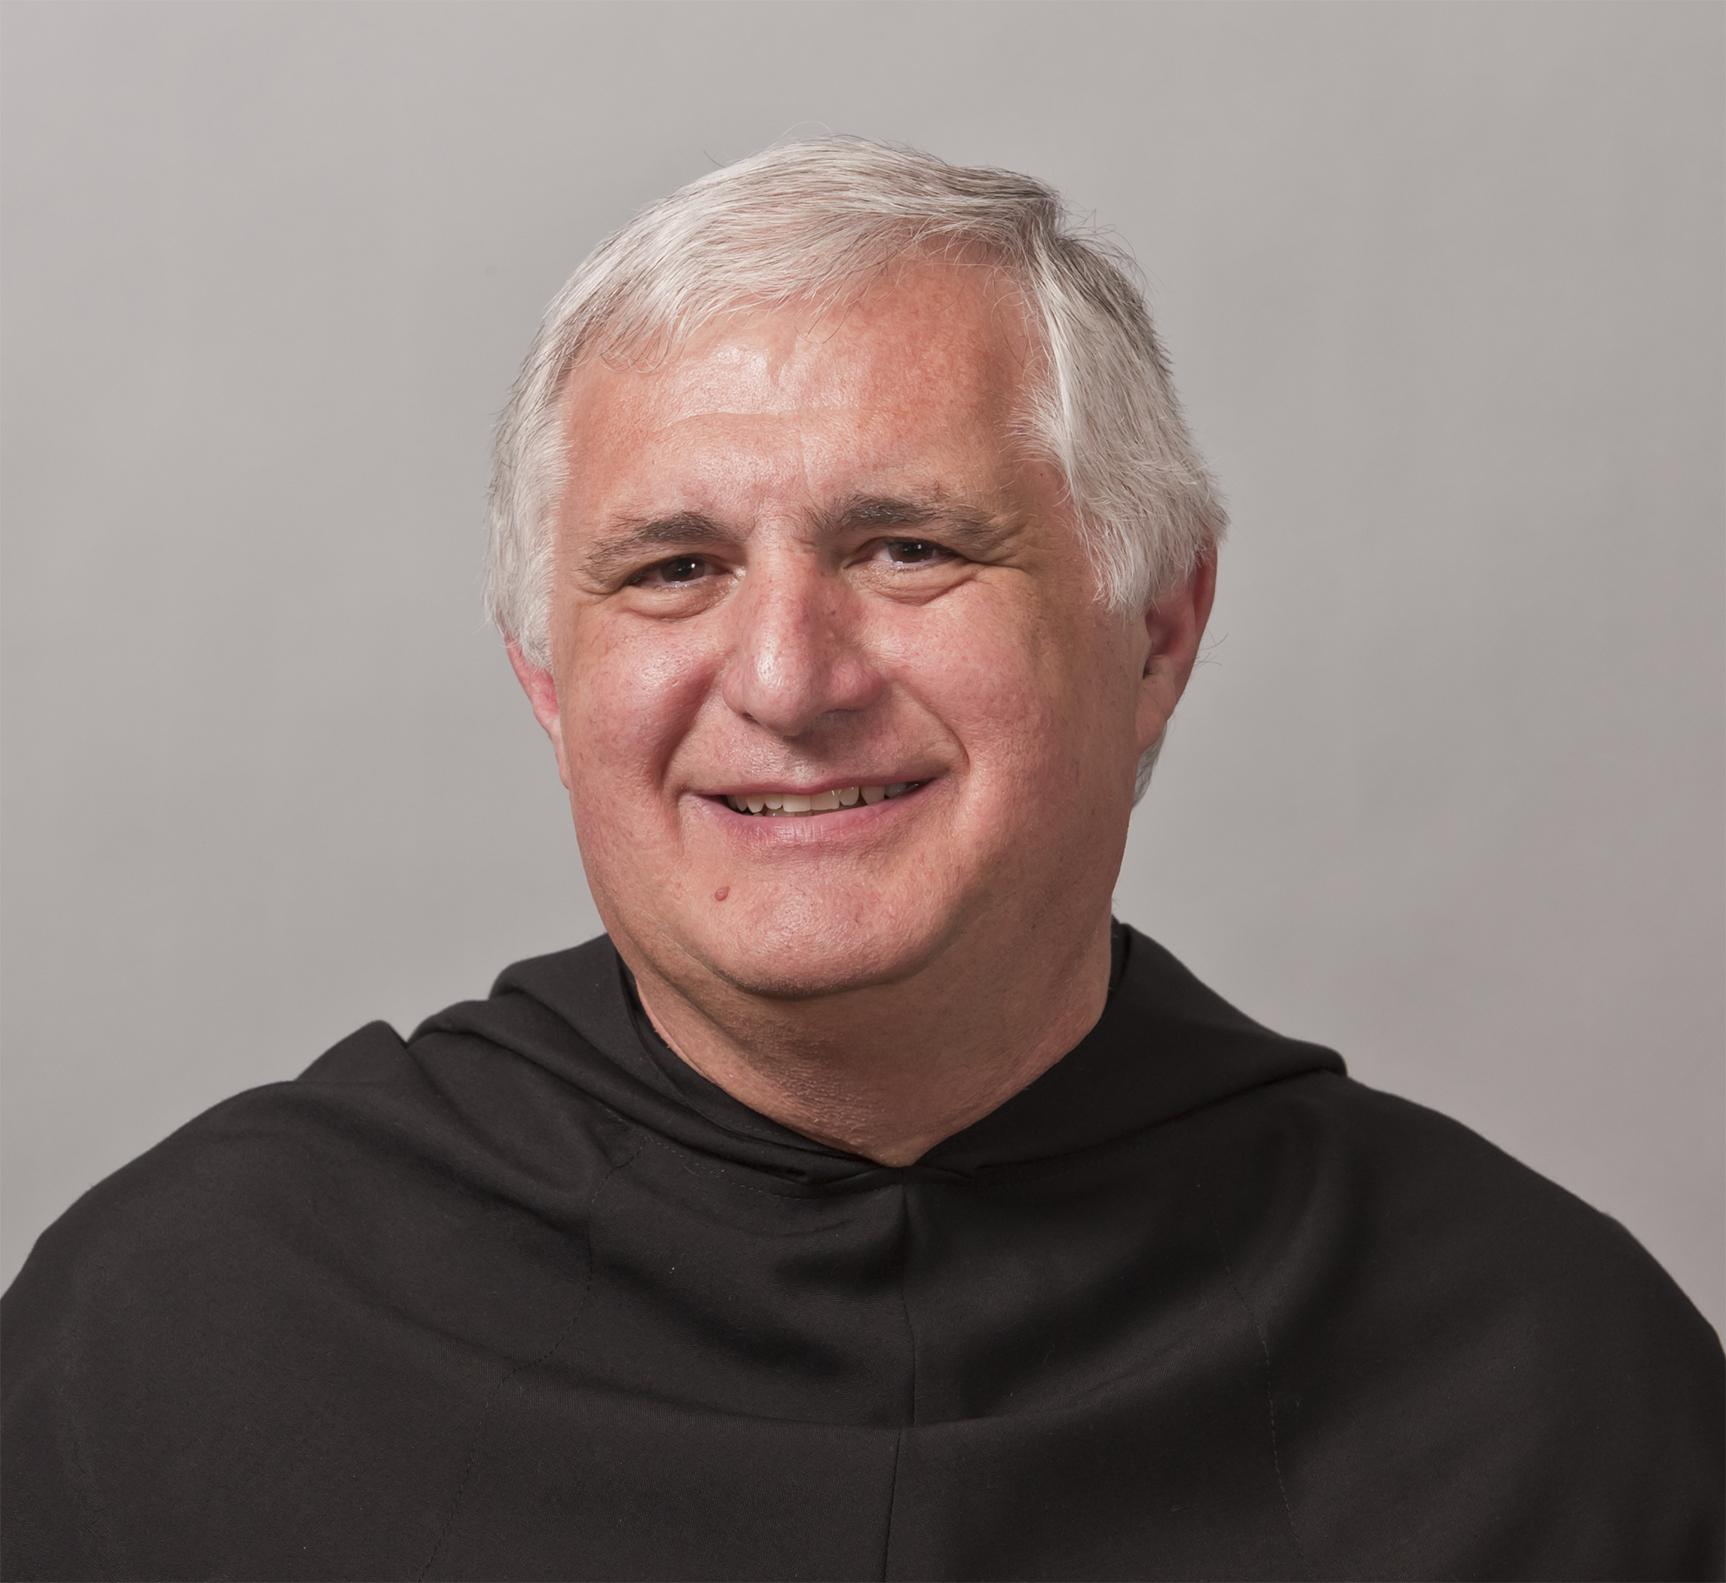 Father Nicholas Martorano, O.S.A.